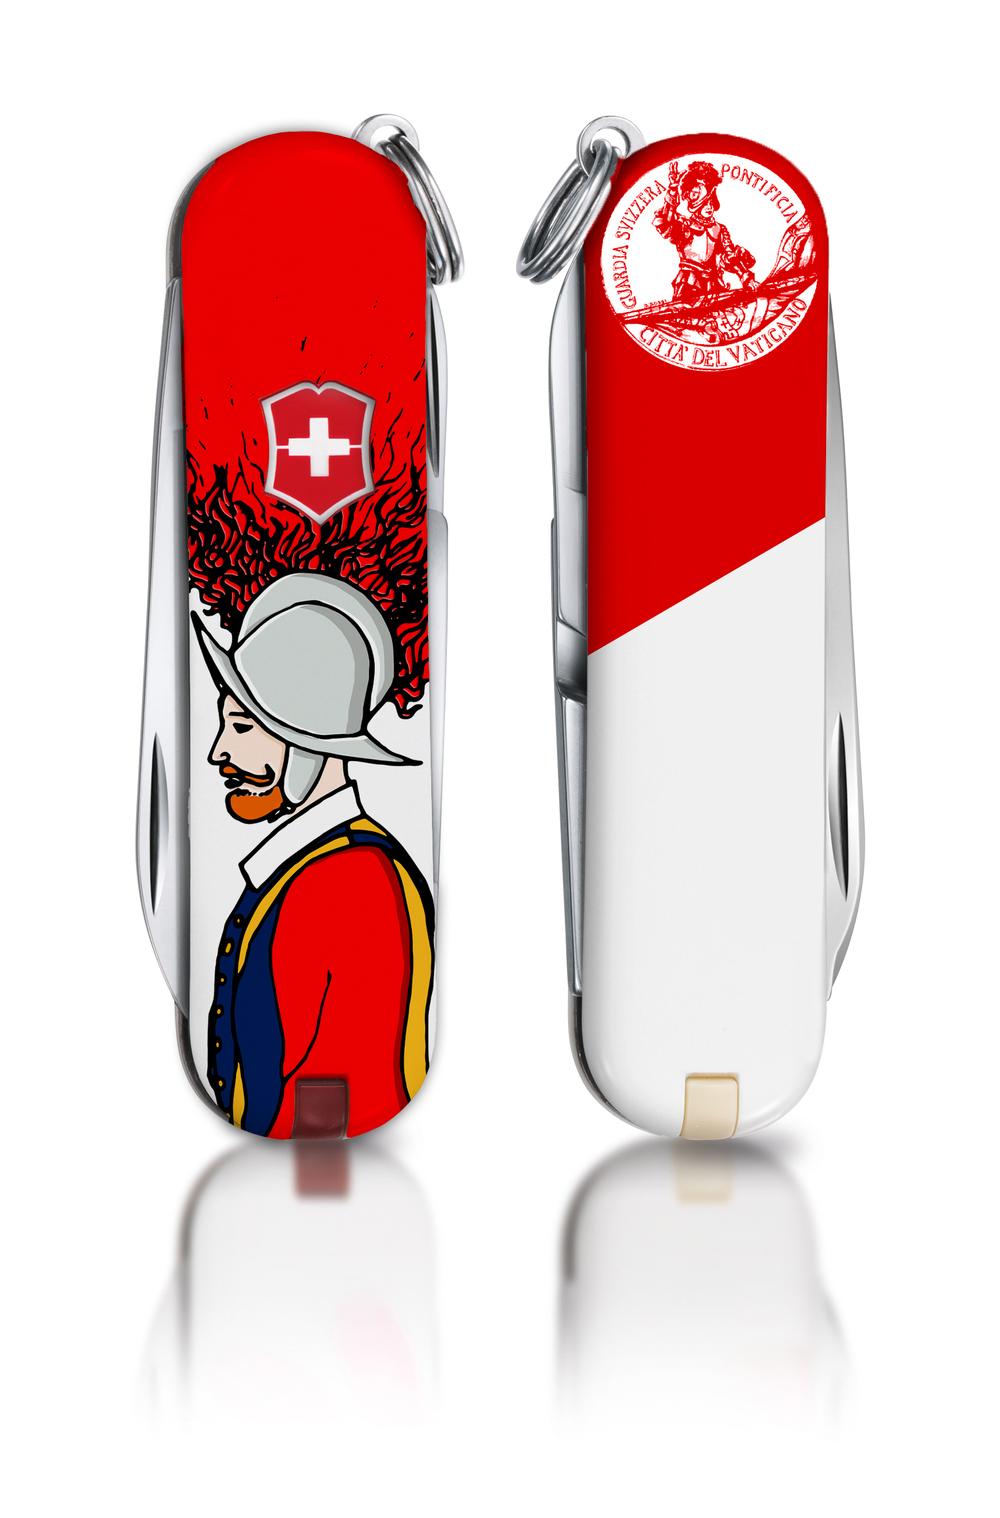 Jovoto Guardia Svizzera Pontificia Your Swiss Army